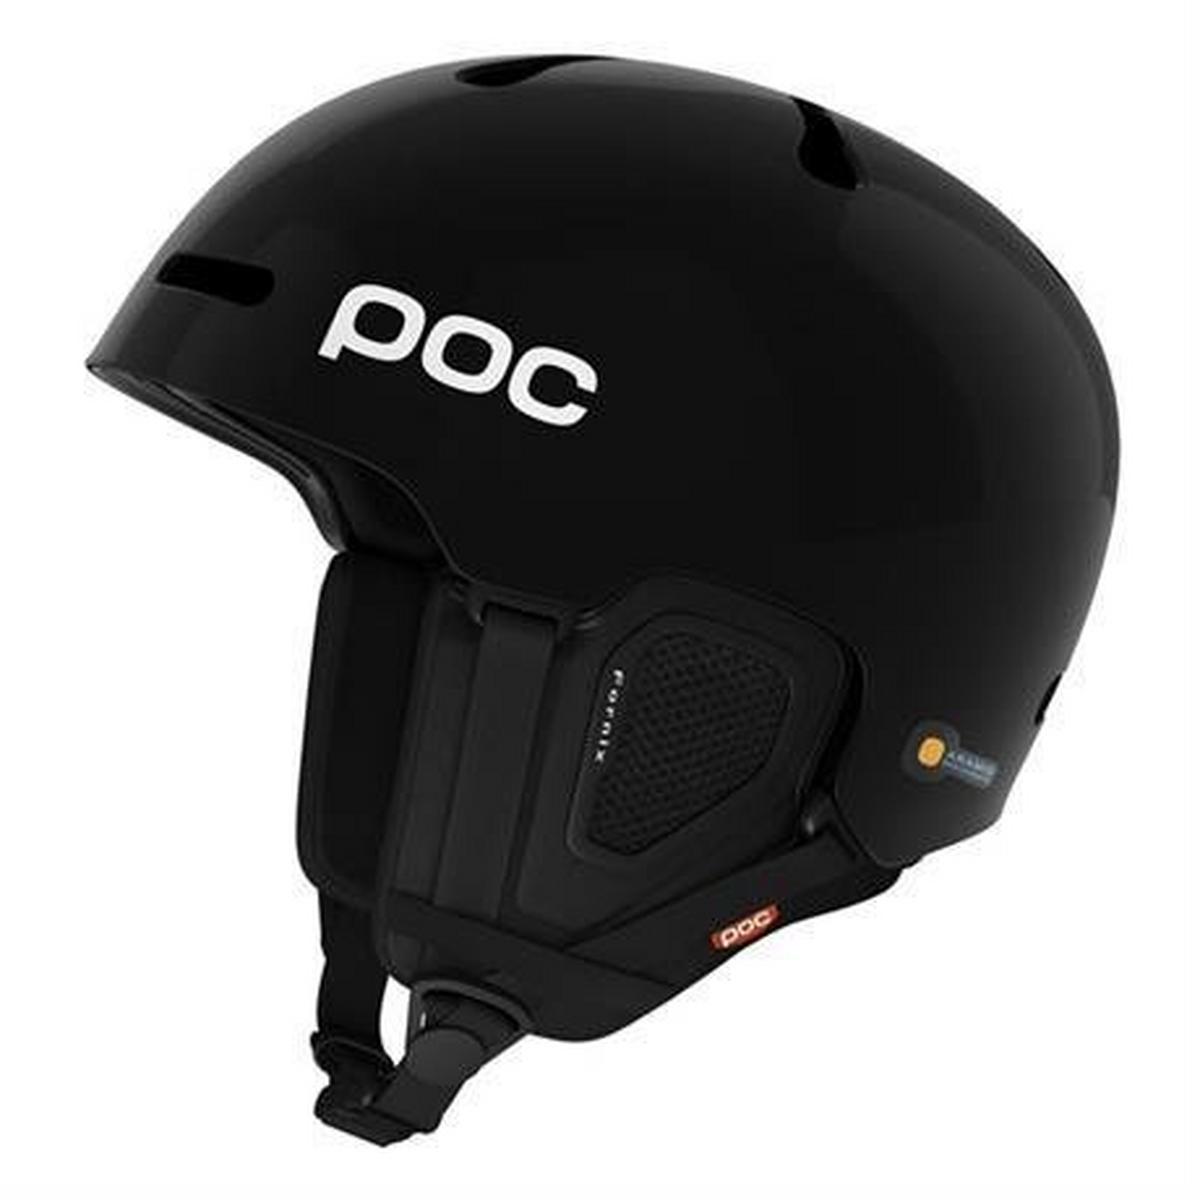 Poc Ski Helmet Fornix Matt Black